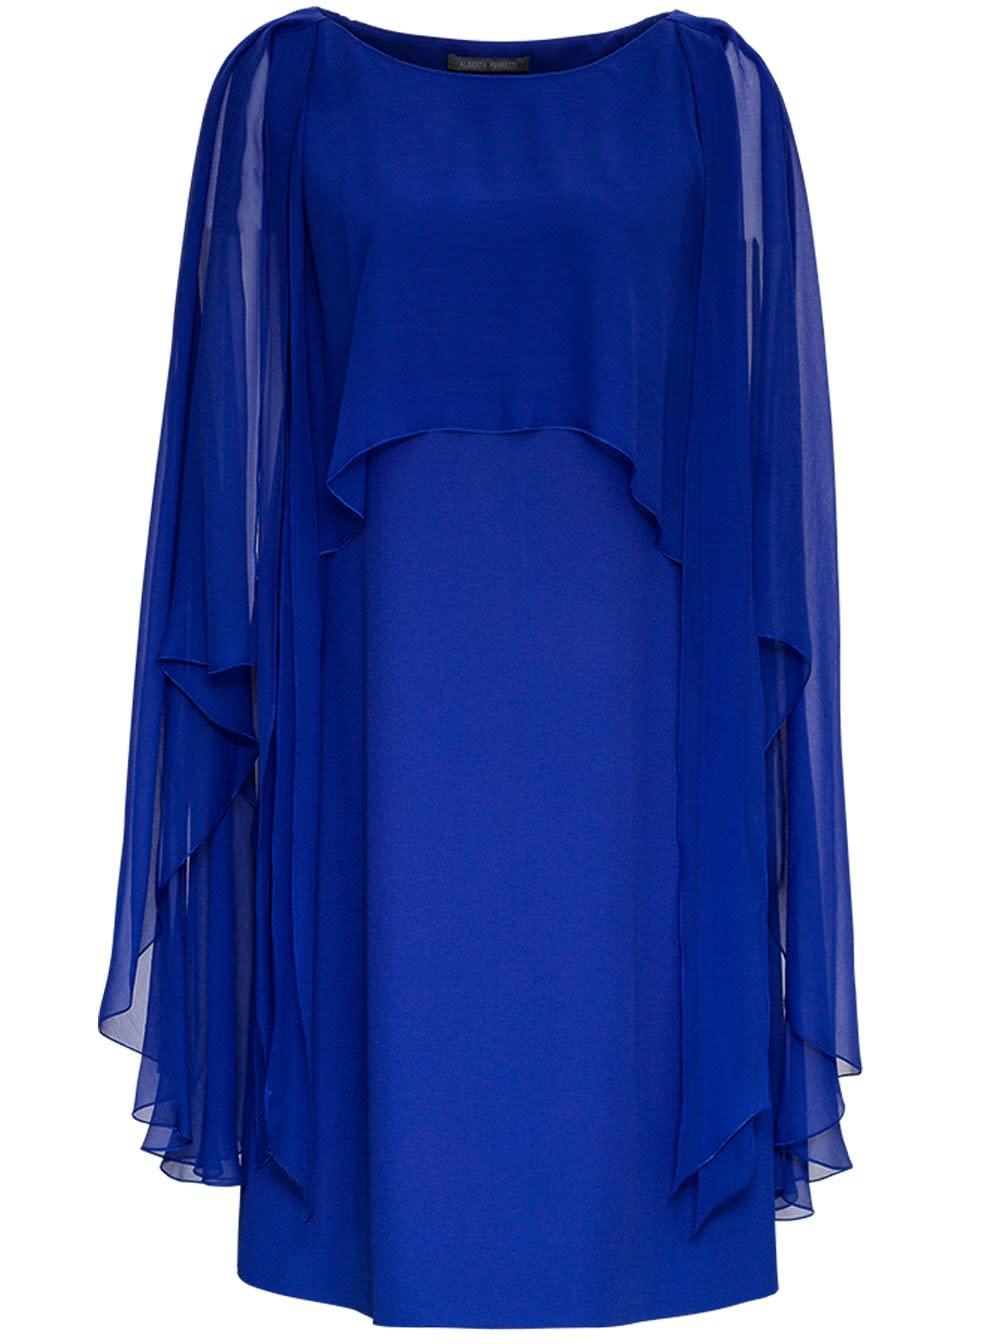 Alberta Ferretti Blue Satin Cape Dress